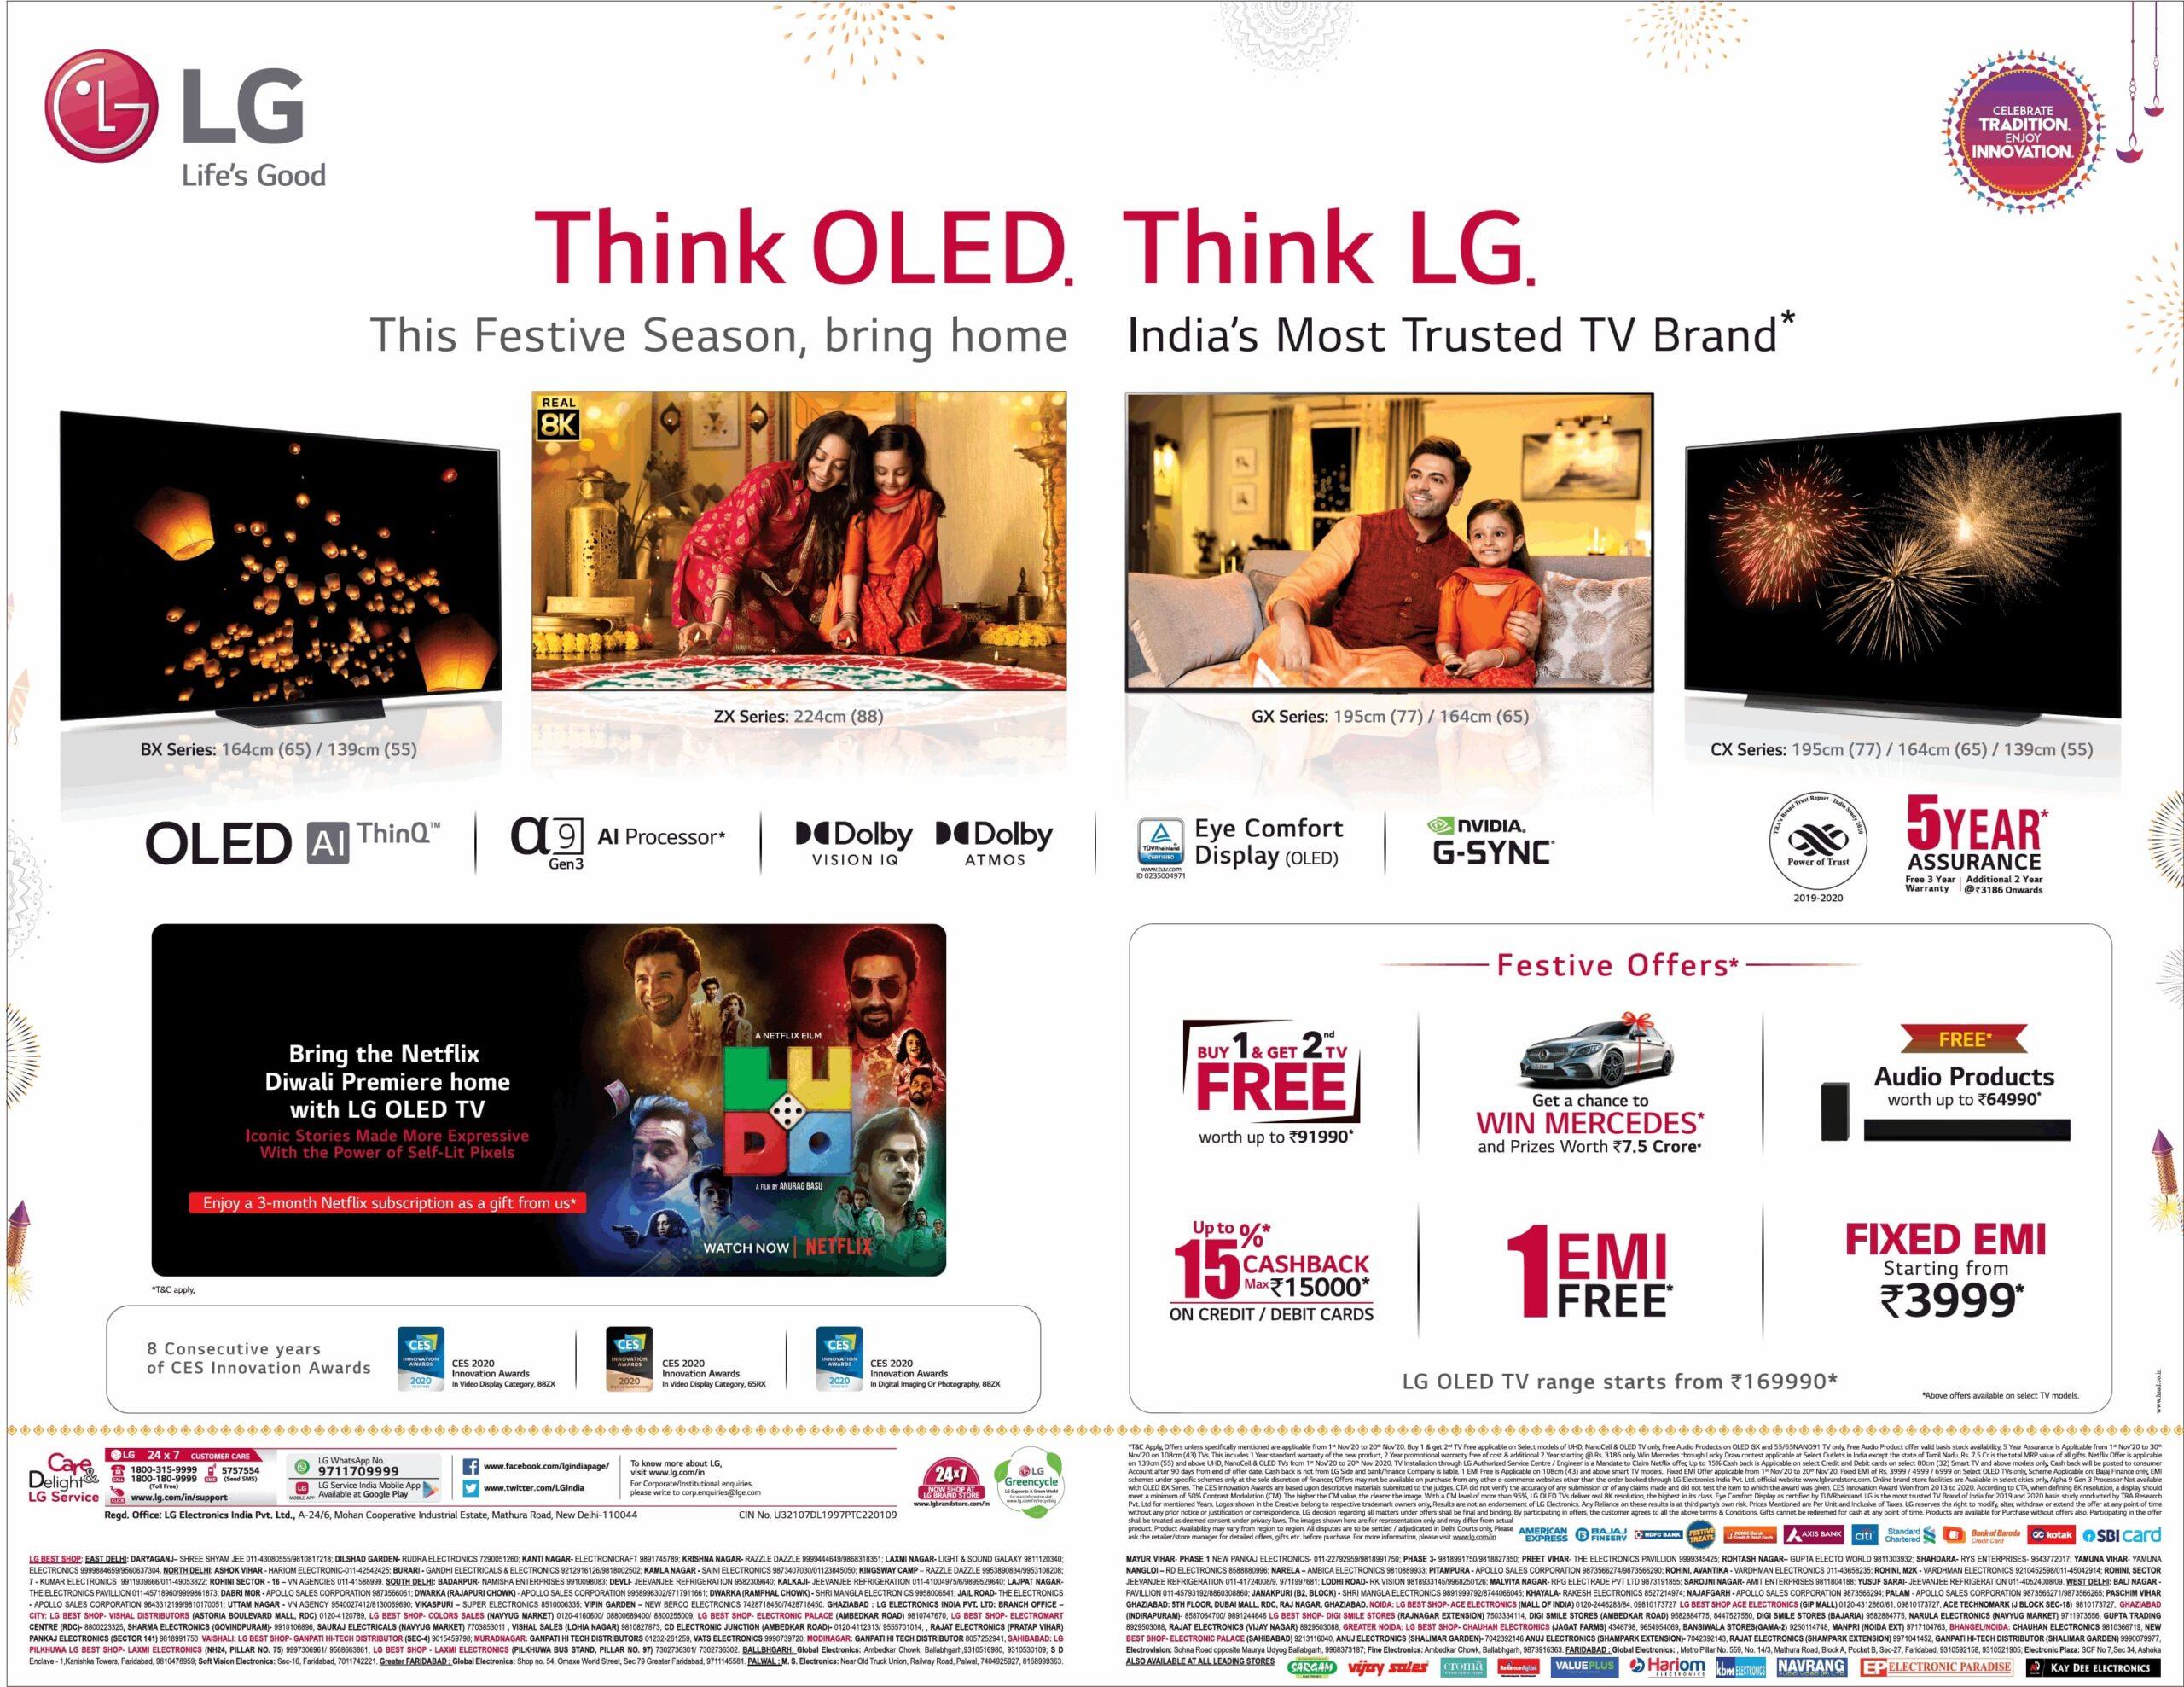 lg-think-oled-think-lg-this-festive-season-bring-home-indias-most-trusted-tv-brand-ad-toi-delhi-13-11-2020